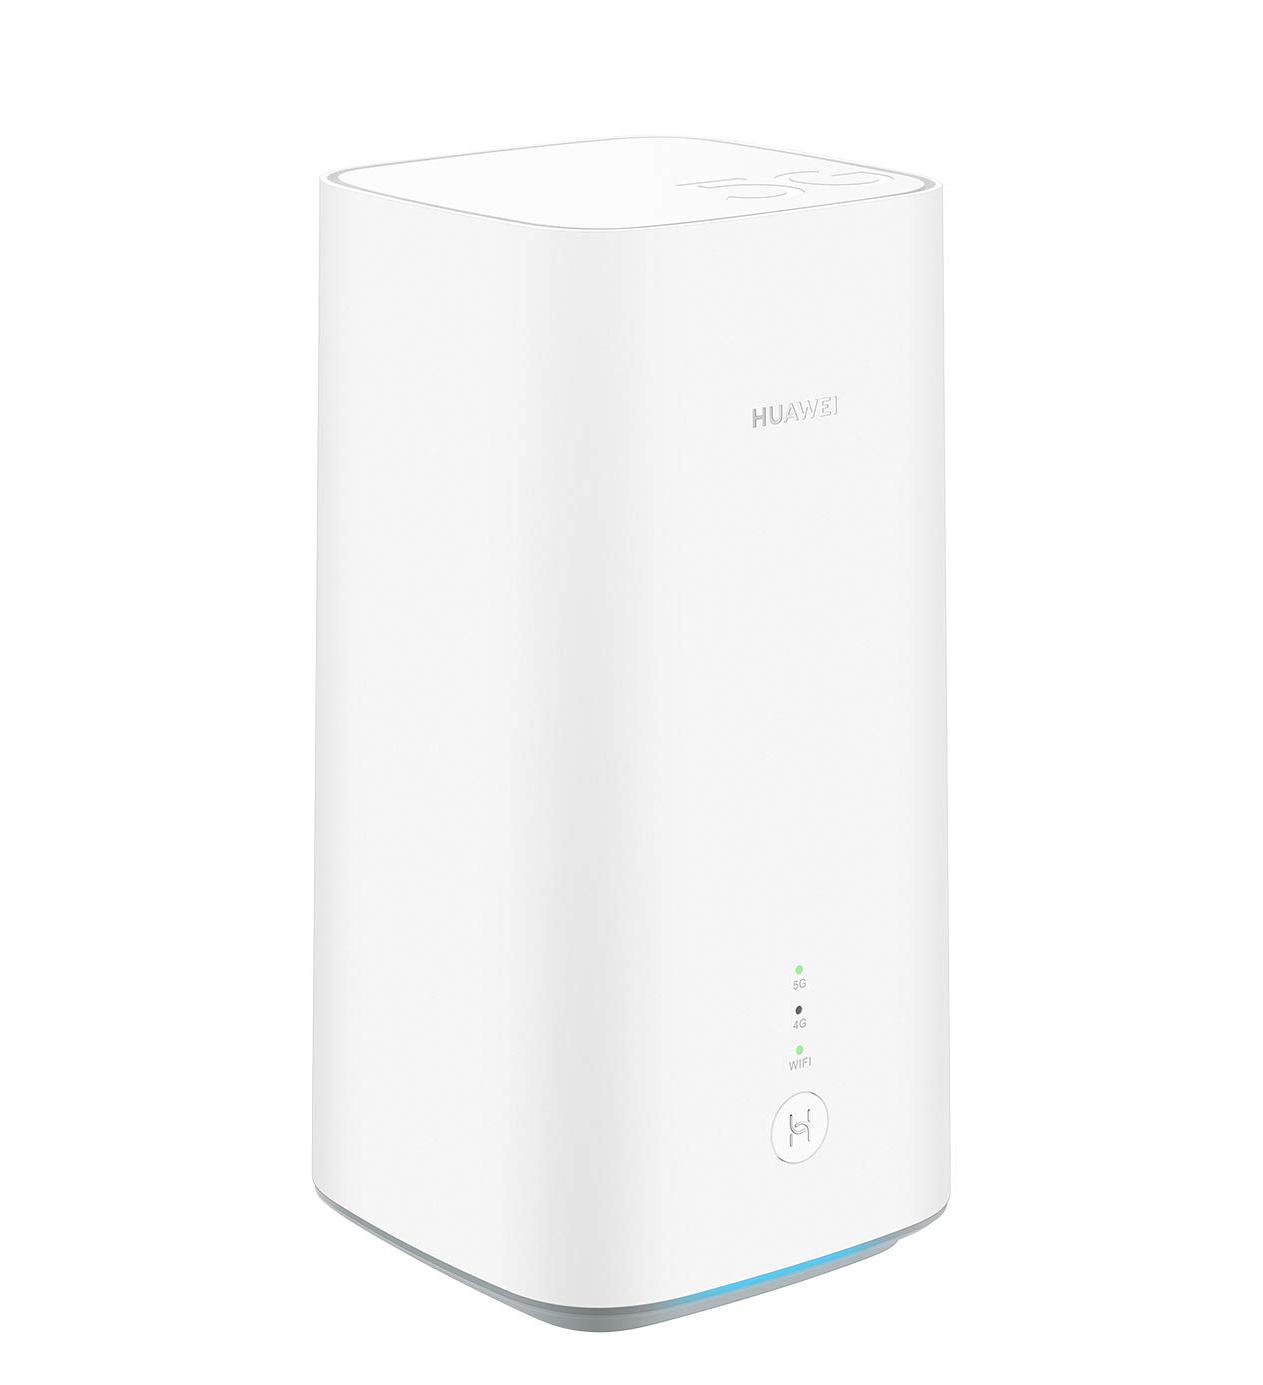 Huawei 5G Router